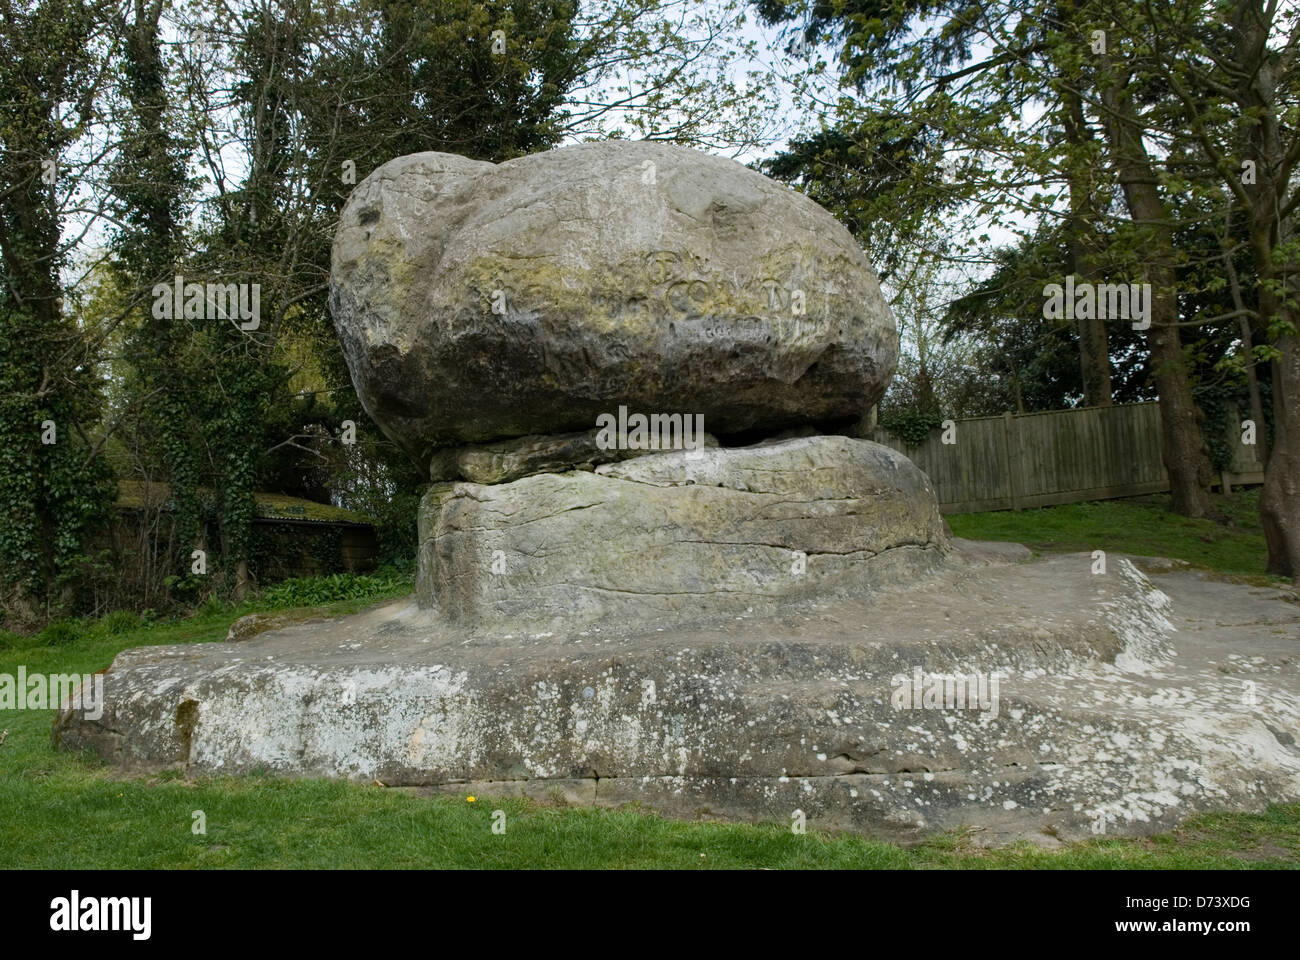 Kent UK Chiddingstone Chiding piedra o sentencia Stone HOMER SYKES Imagen De Stock